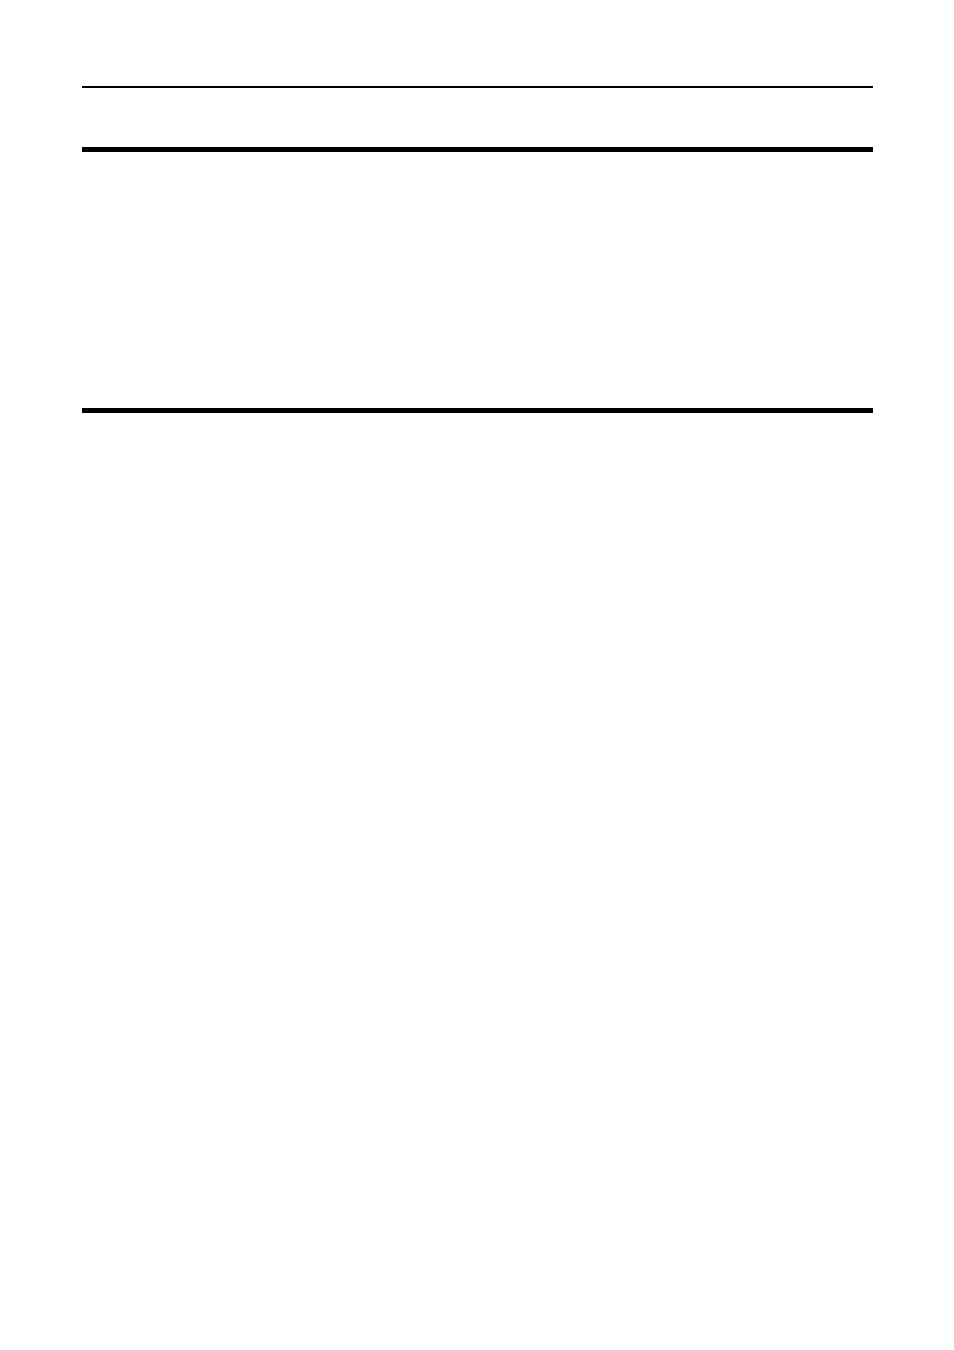 Sensor zeroing, Details editor | MoTeC SDL User Manual